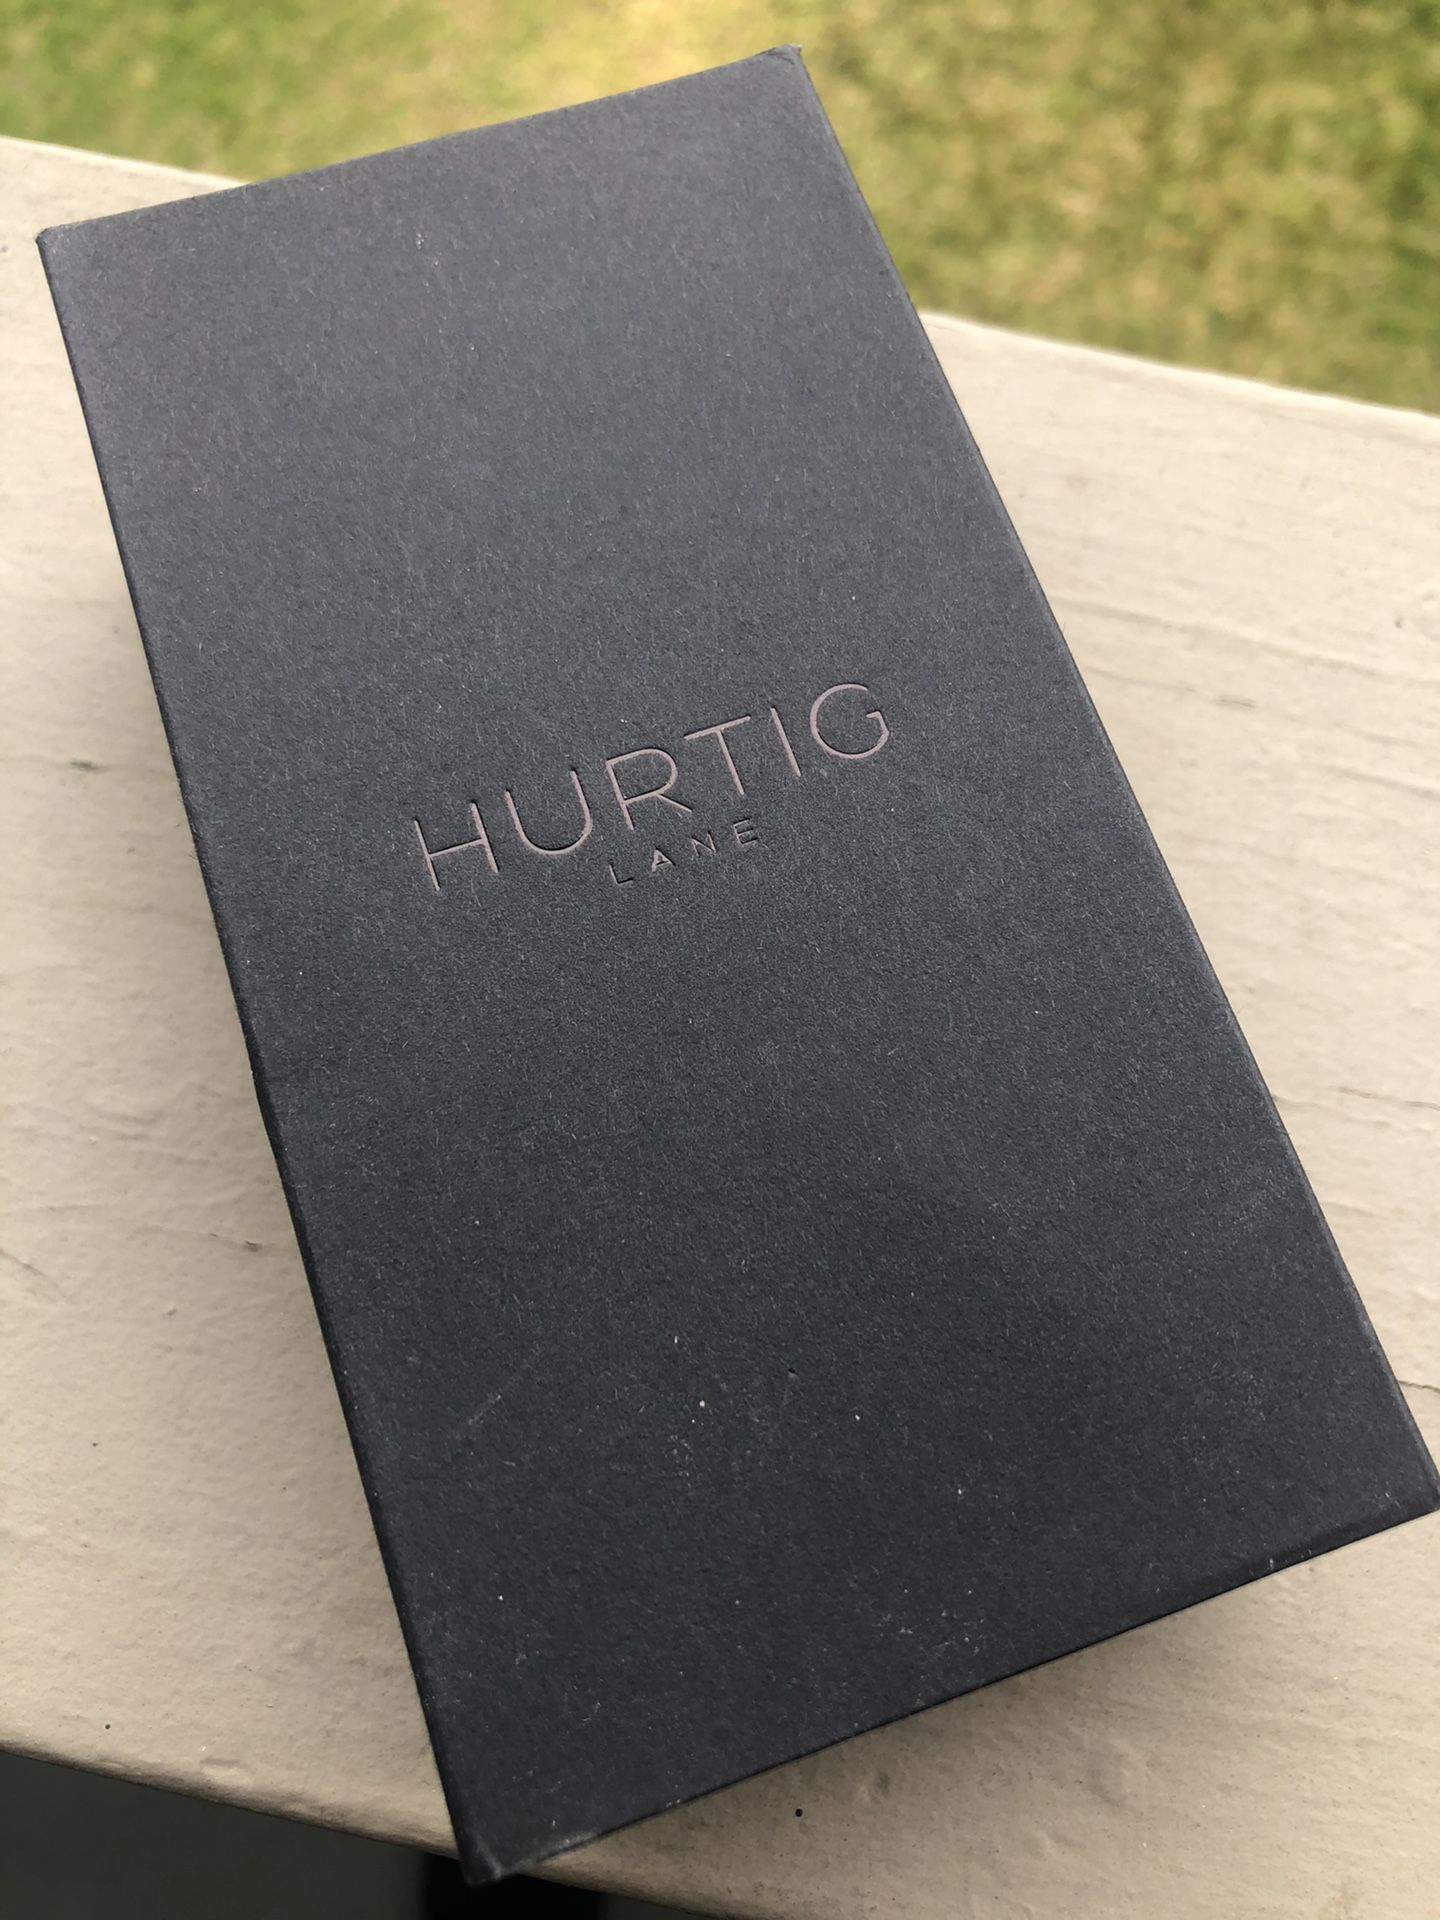 Hurtig Mens Watch (no Animal Parts Used)